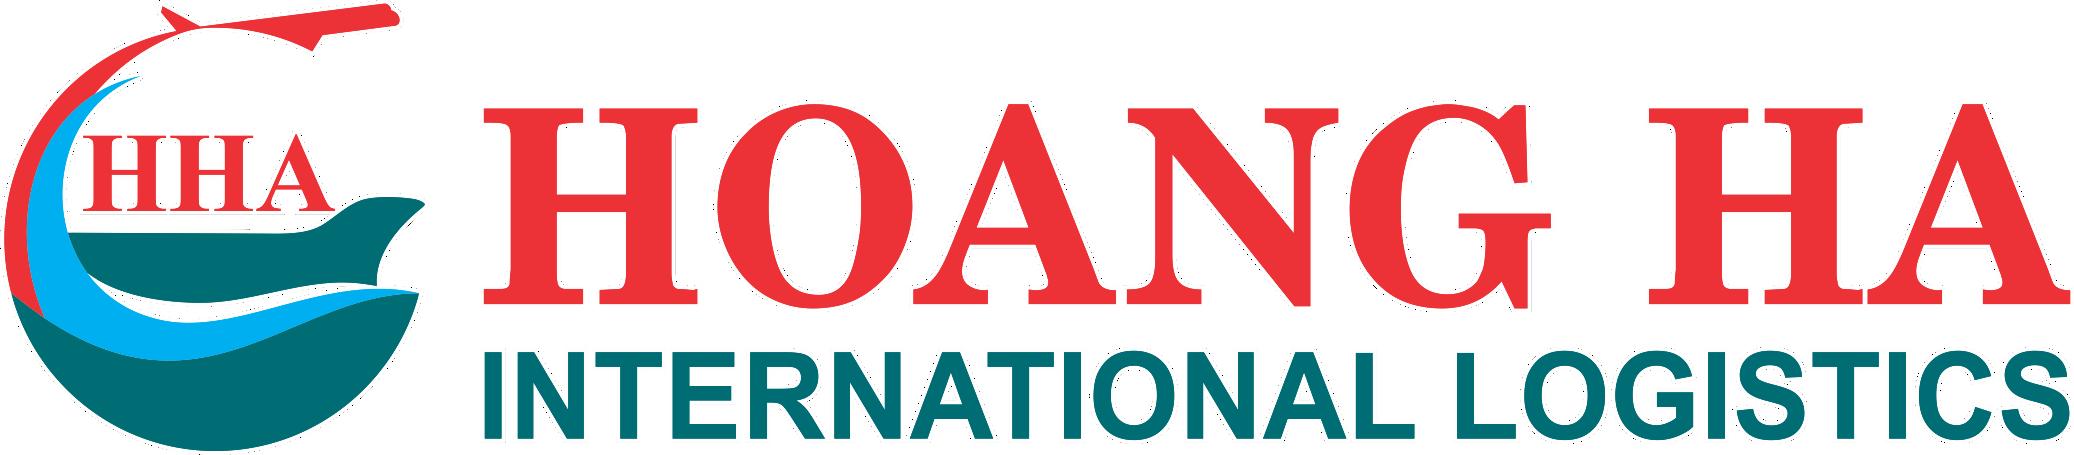 Hoang Ha International Logistics